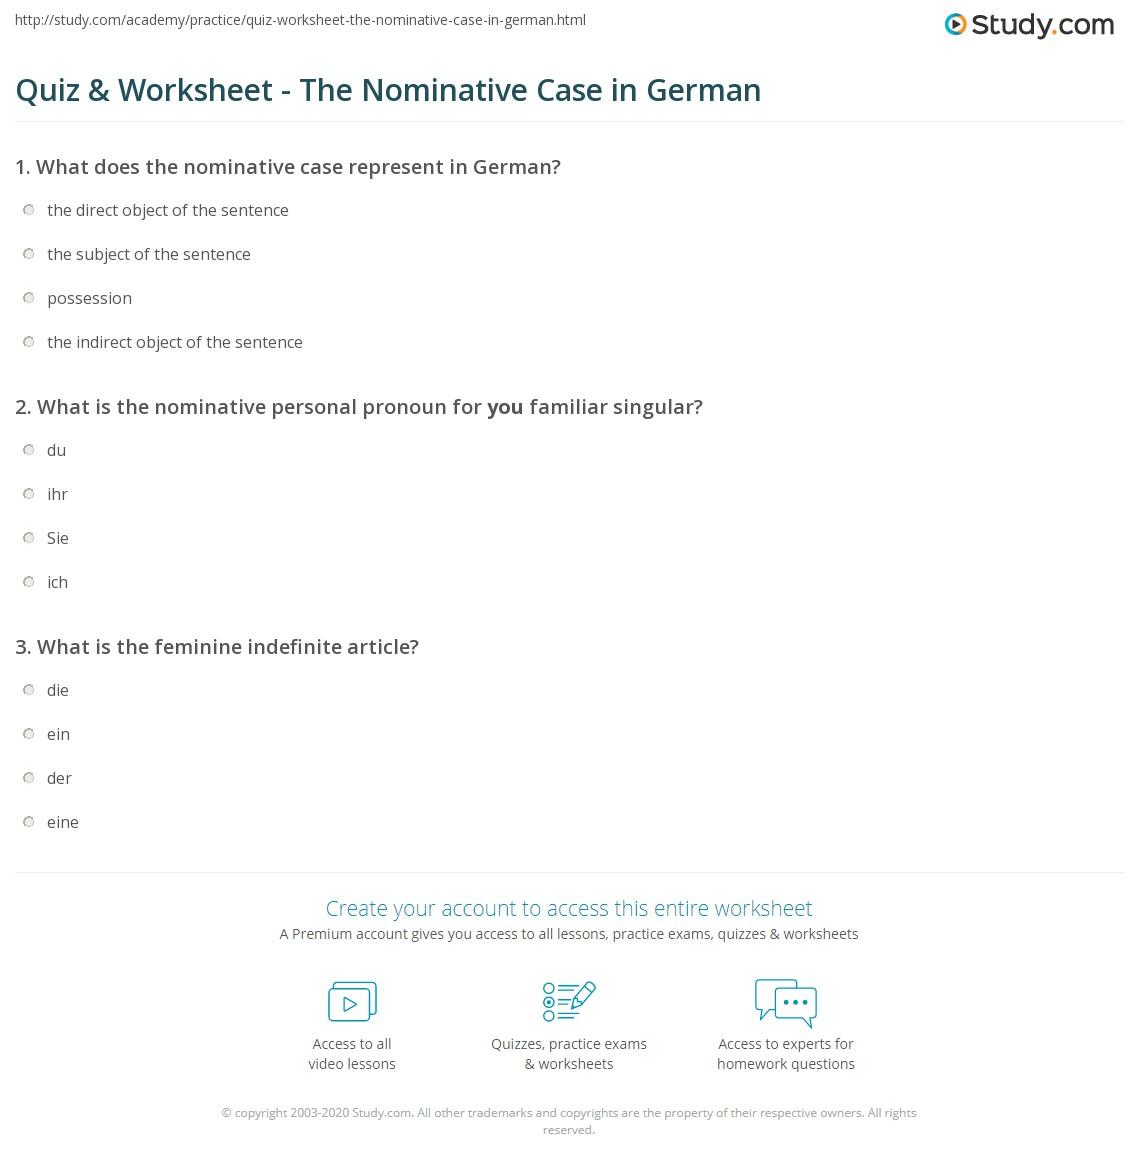 worksheet Nominative Case Pronouns Worksheets quiz worksheet the nominative case in german study com print definition examples worksheet